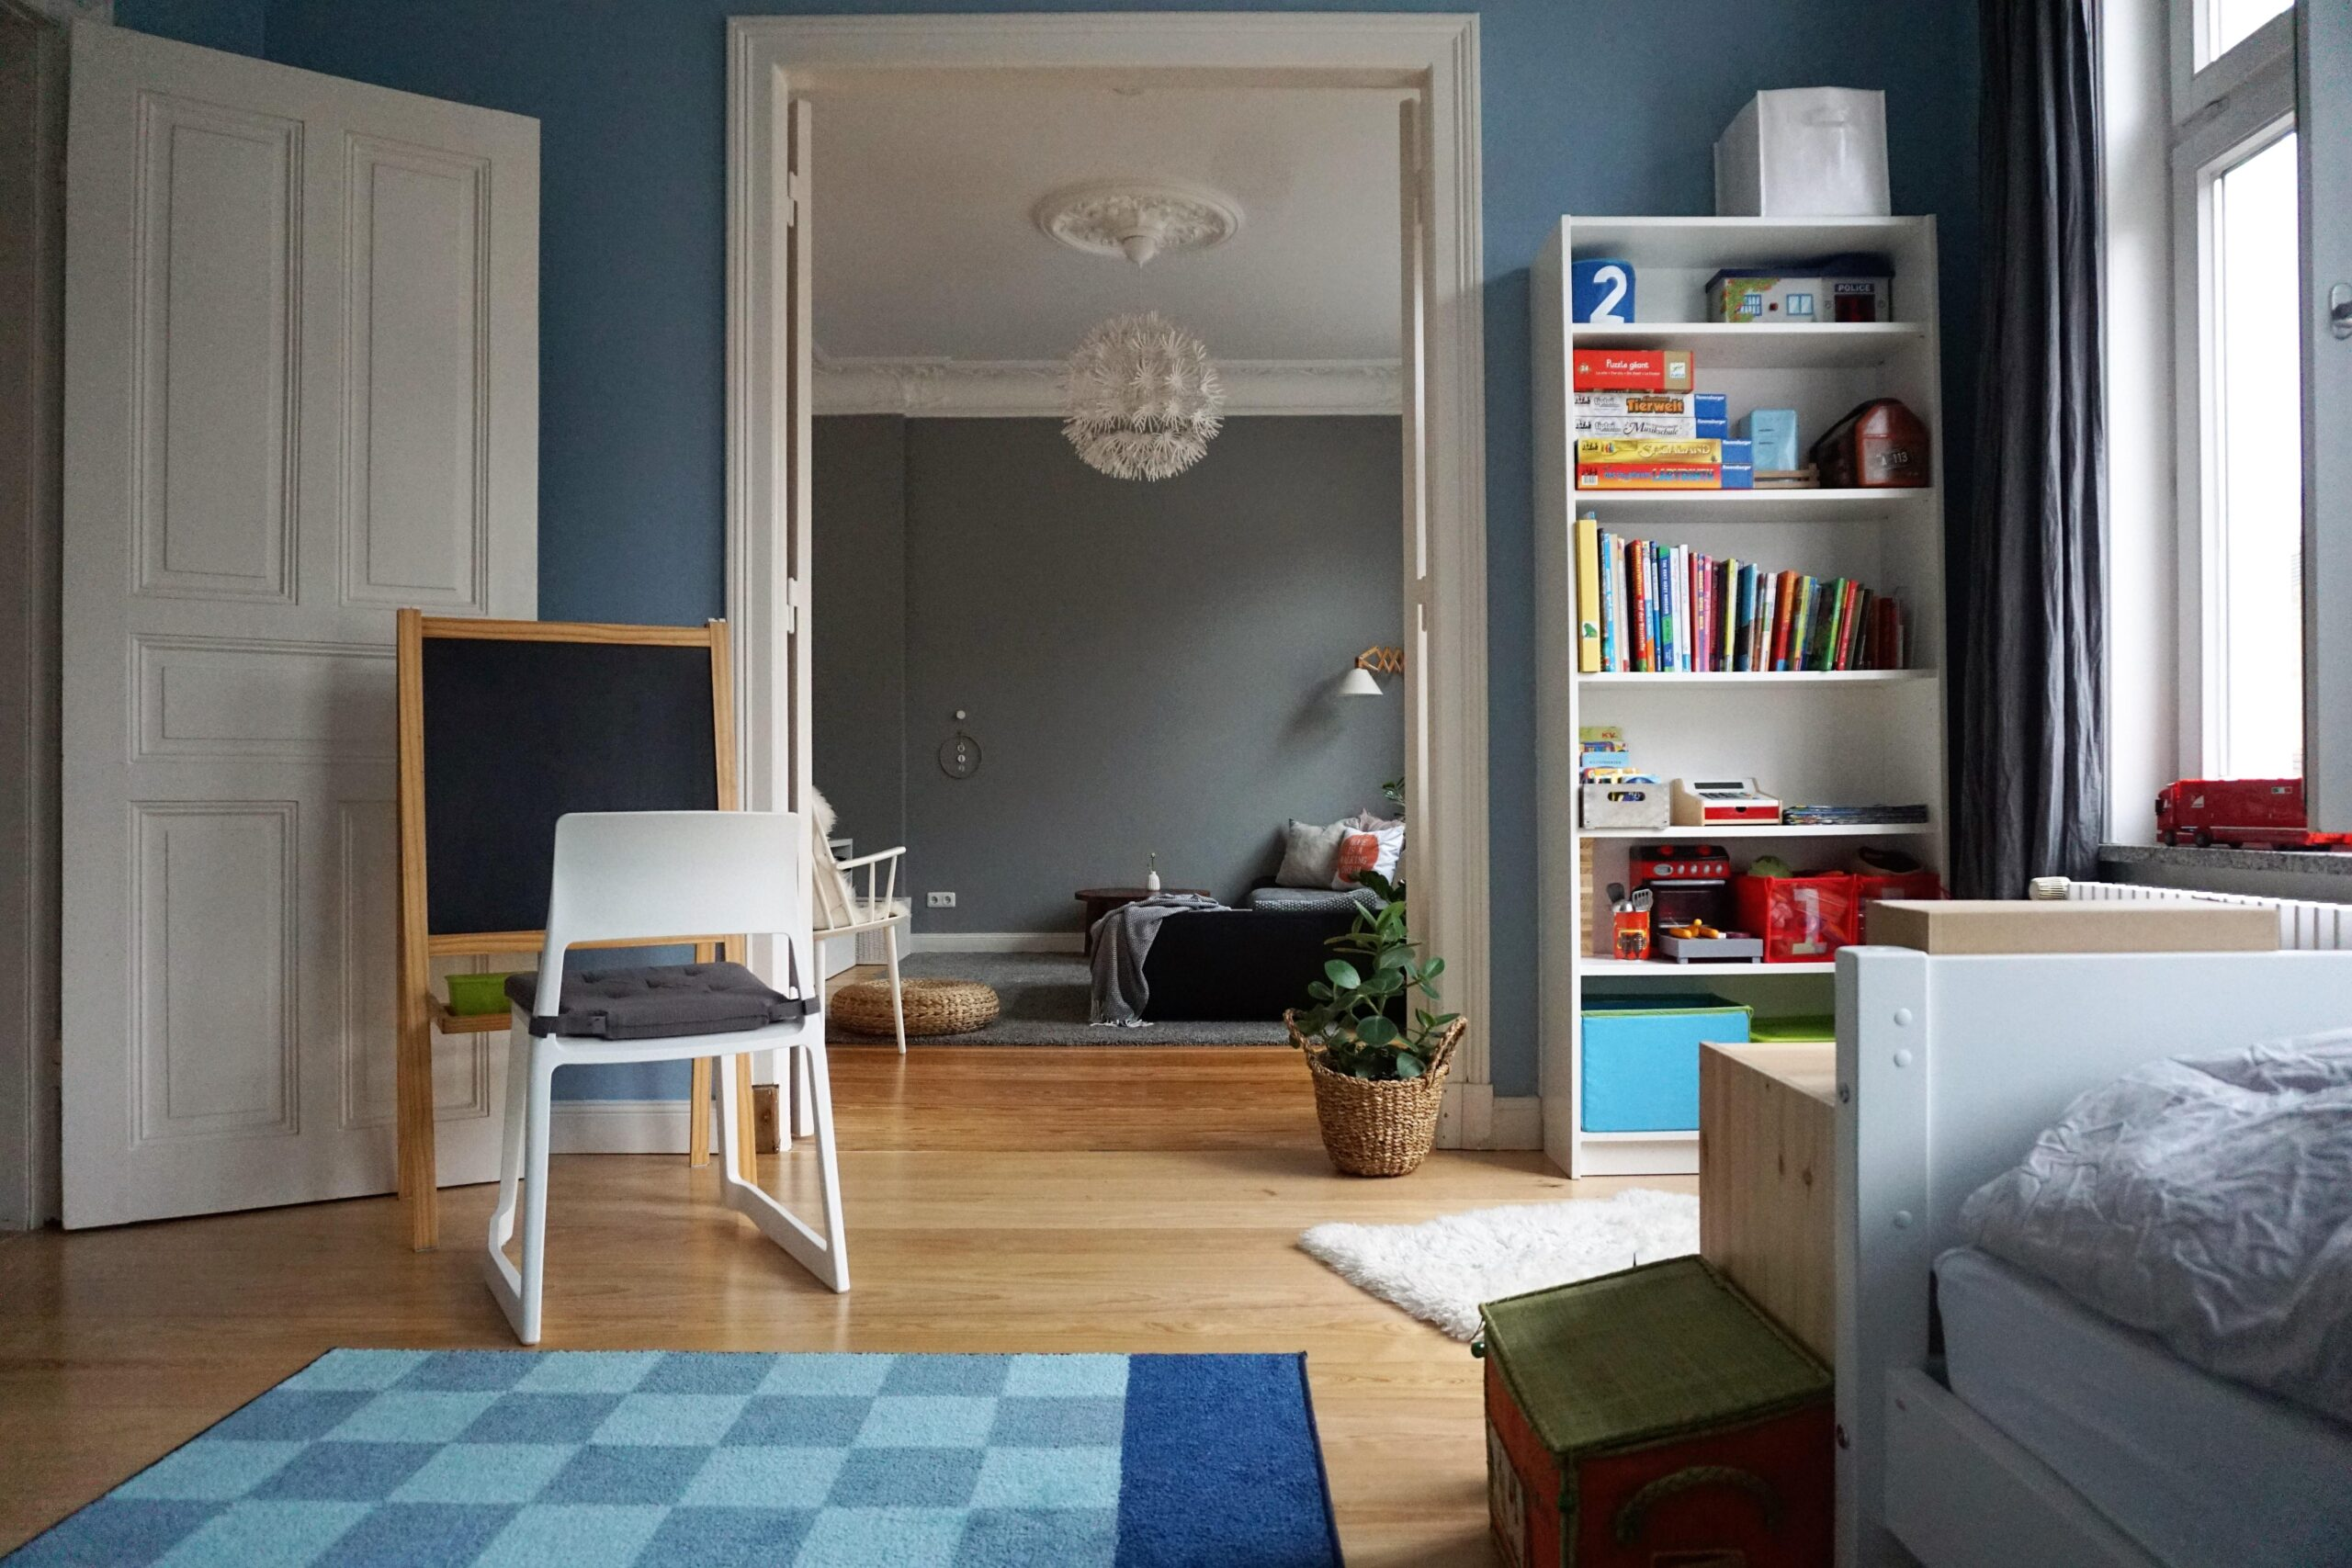 Full Size of Regal Kinderzimmer Weiß Regale Sofa Kinderzimmer Kinderzimmer Bücherregal